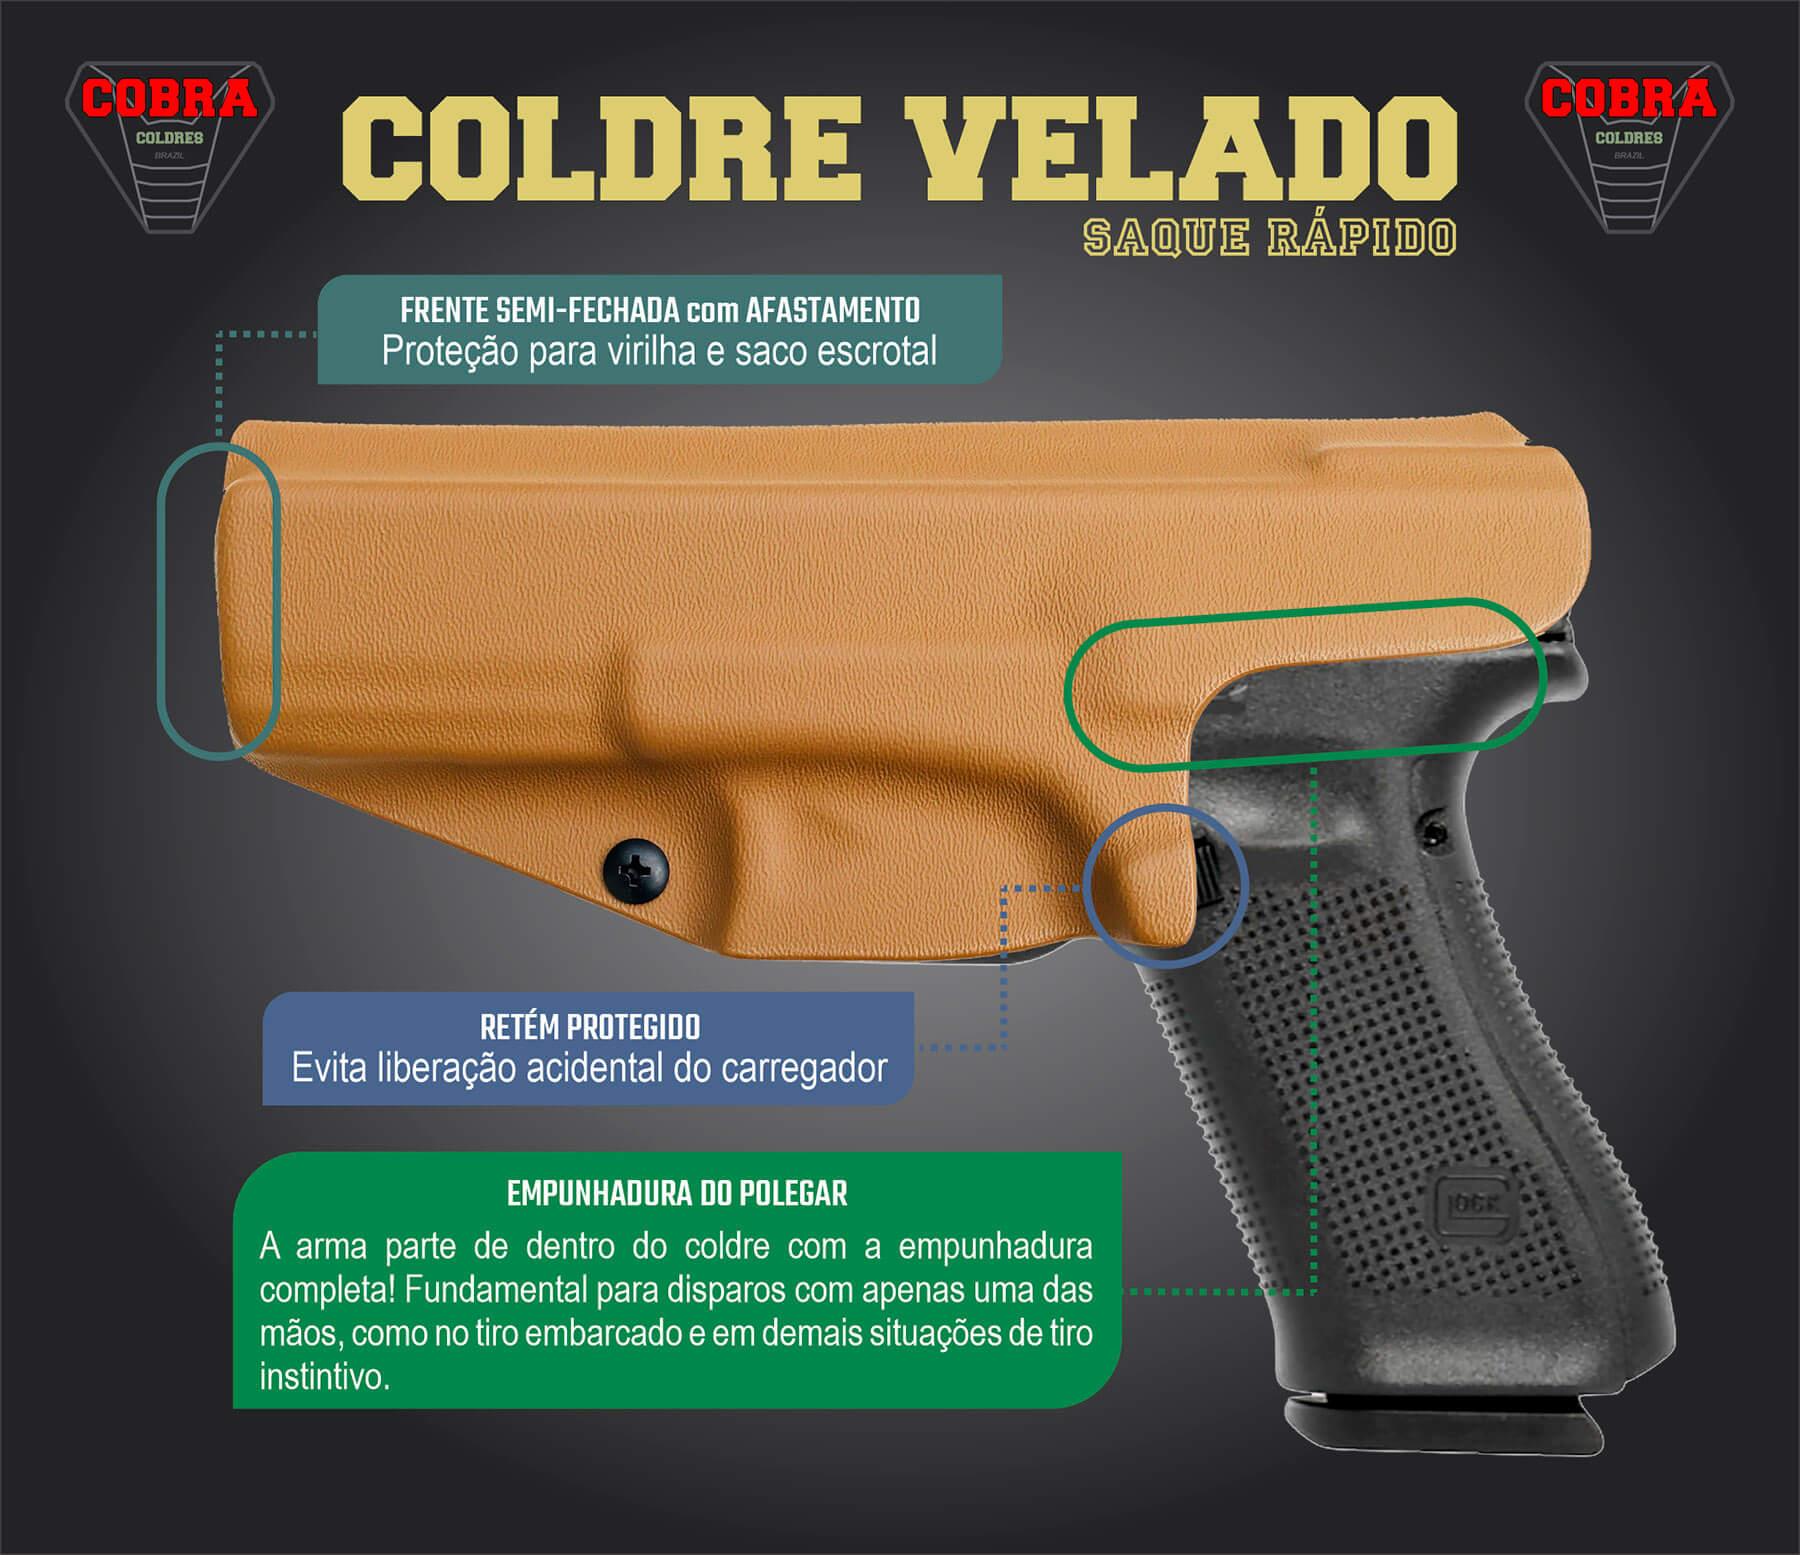 "Coldre [TS9] [TS] Kydex® + Porta-Carregador - Taurus Striker - Slim - Saque Rápido Velado - 080"""